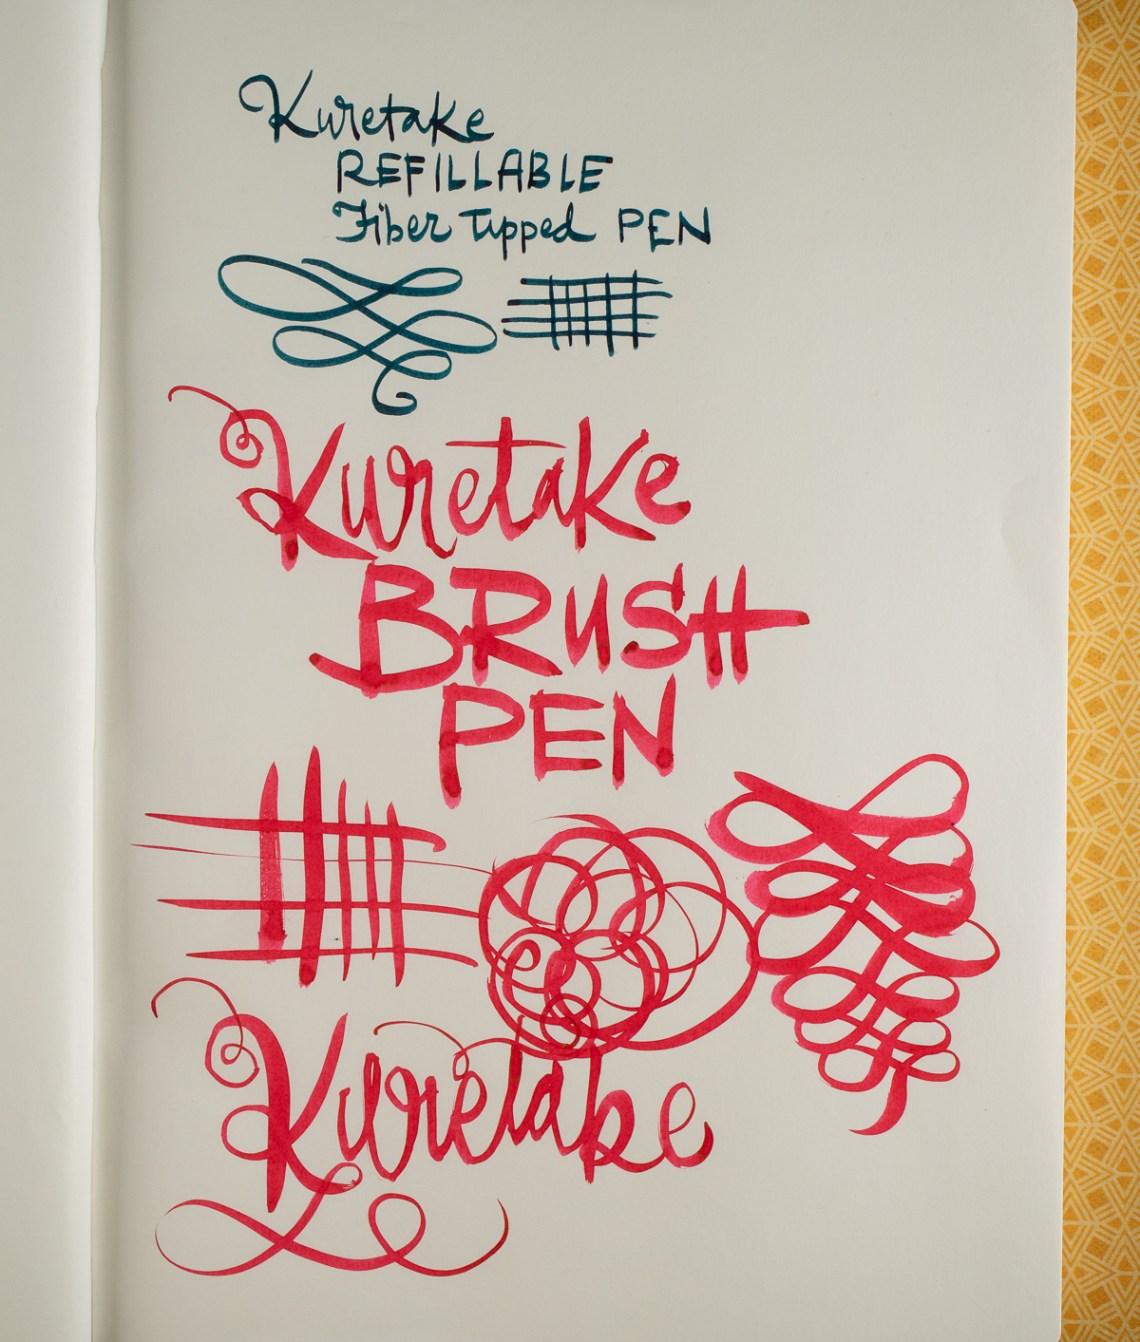 Kuretake Karappo Empty Brush Pens